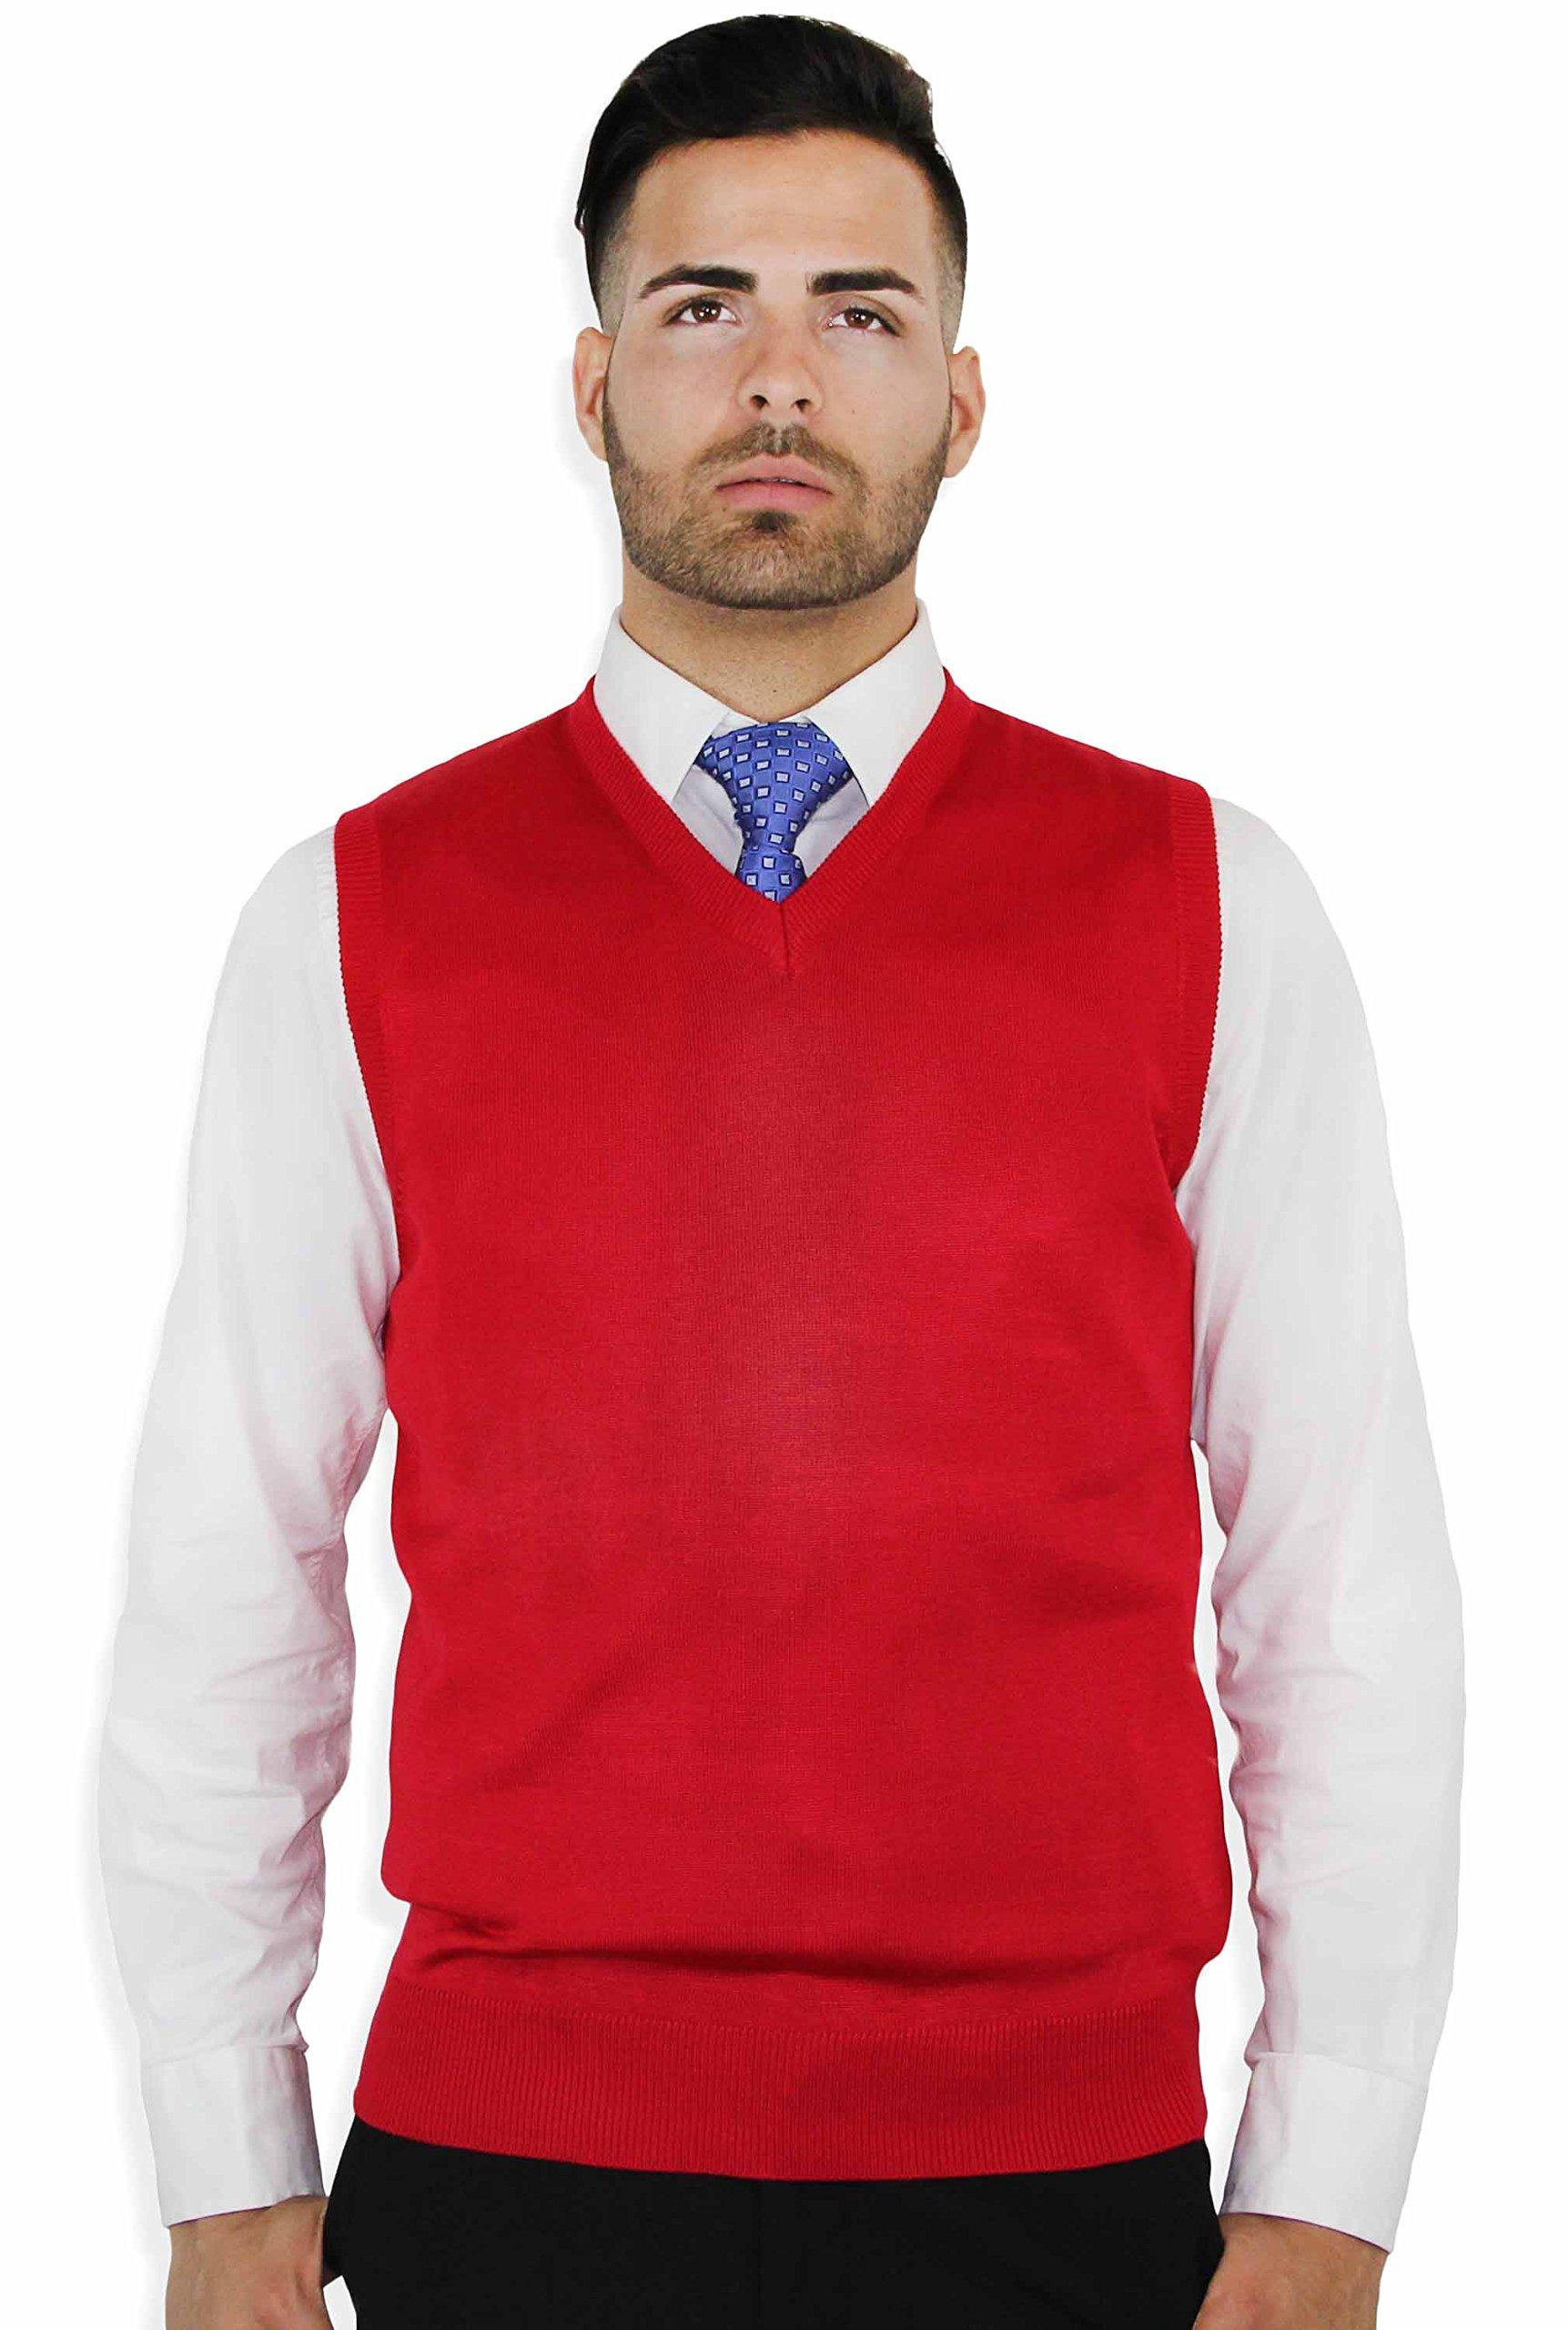 Blue Ocean Solid Color Sweater Vest Red Large